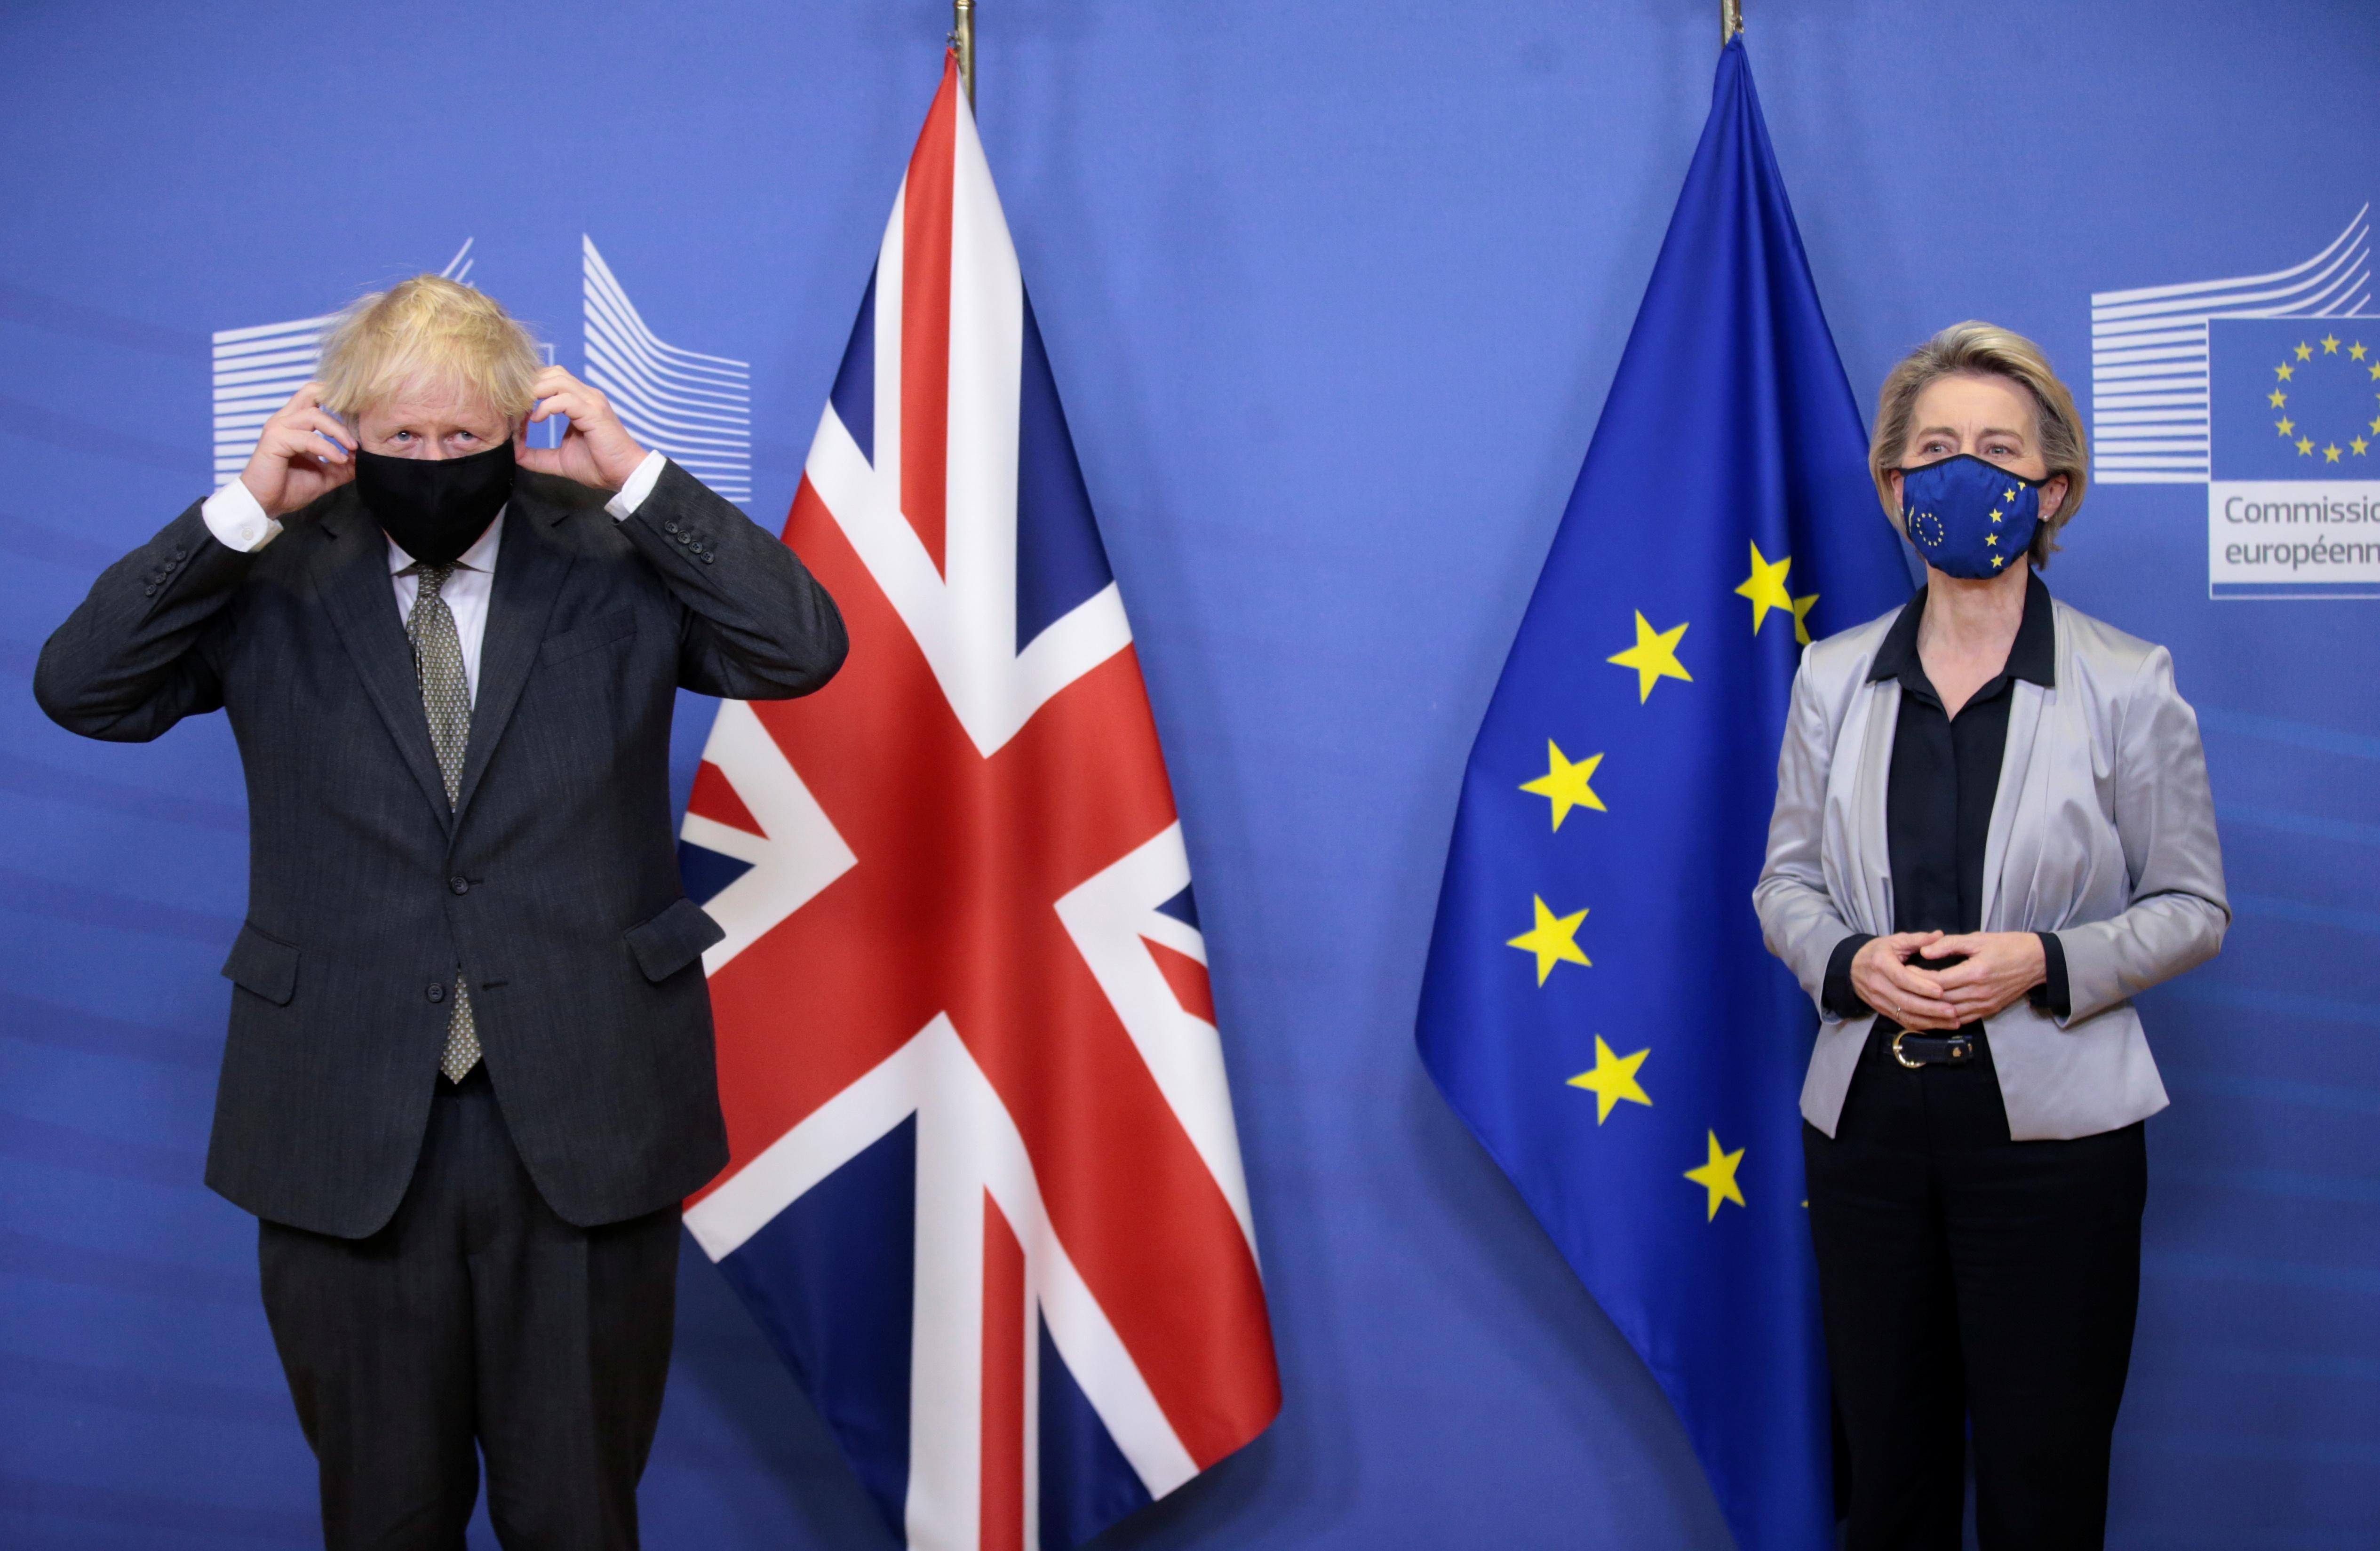 British Prime Minister Boris Johnson adjusts his face mask as he meets European Commission President Ursula von der Leyen in Brussels, Belgium December 9, 2020.